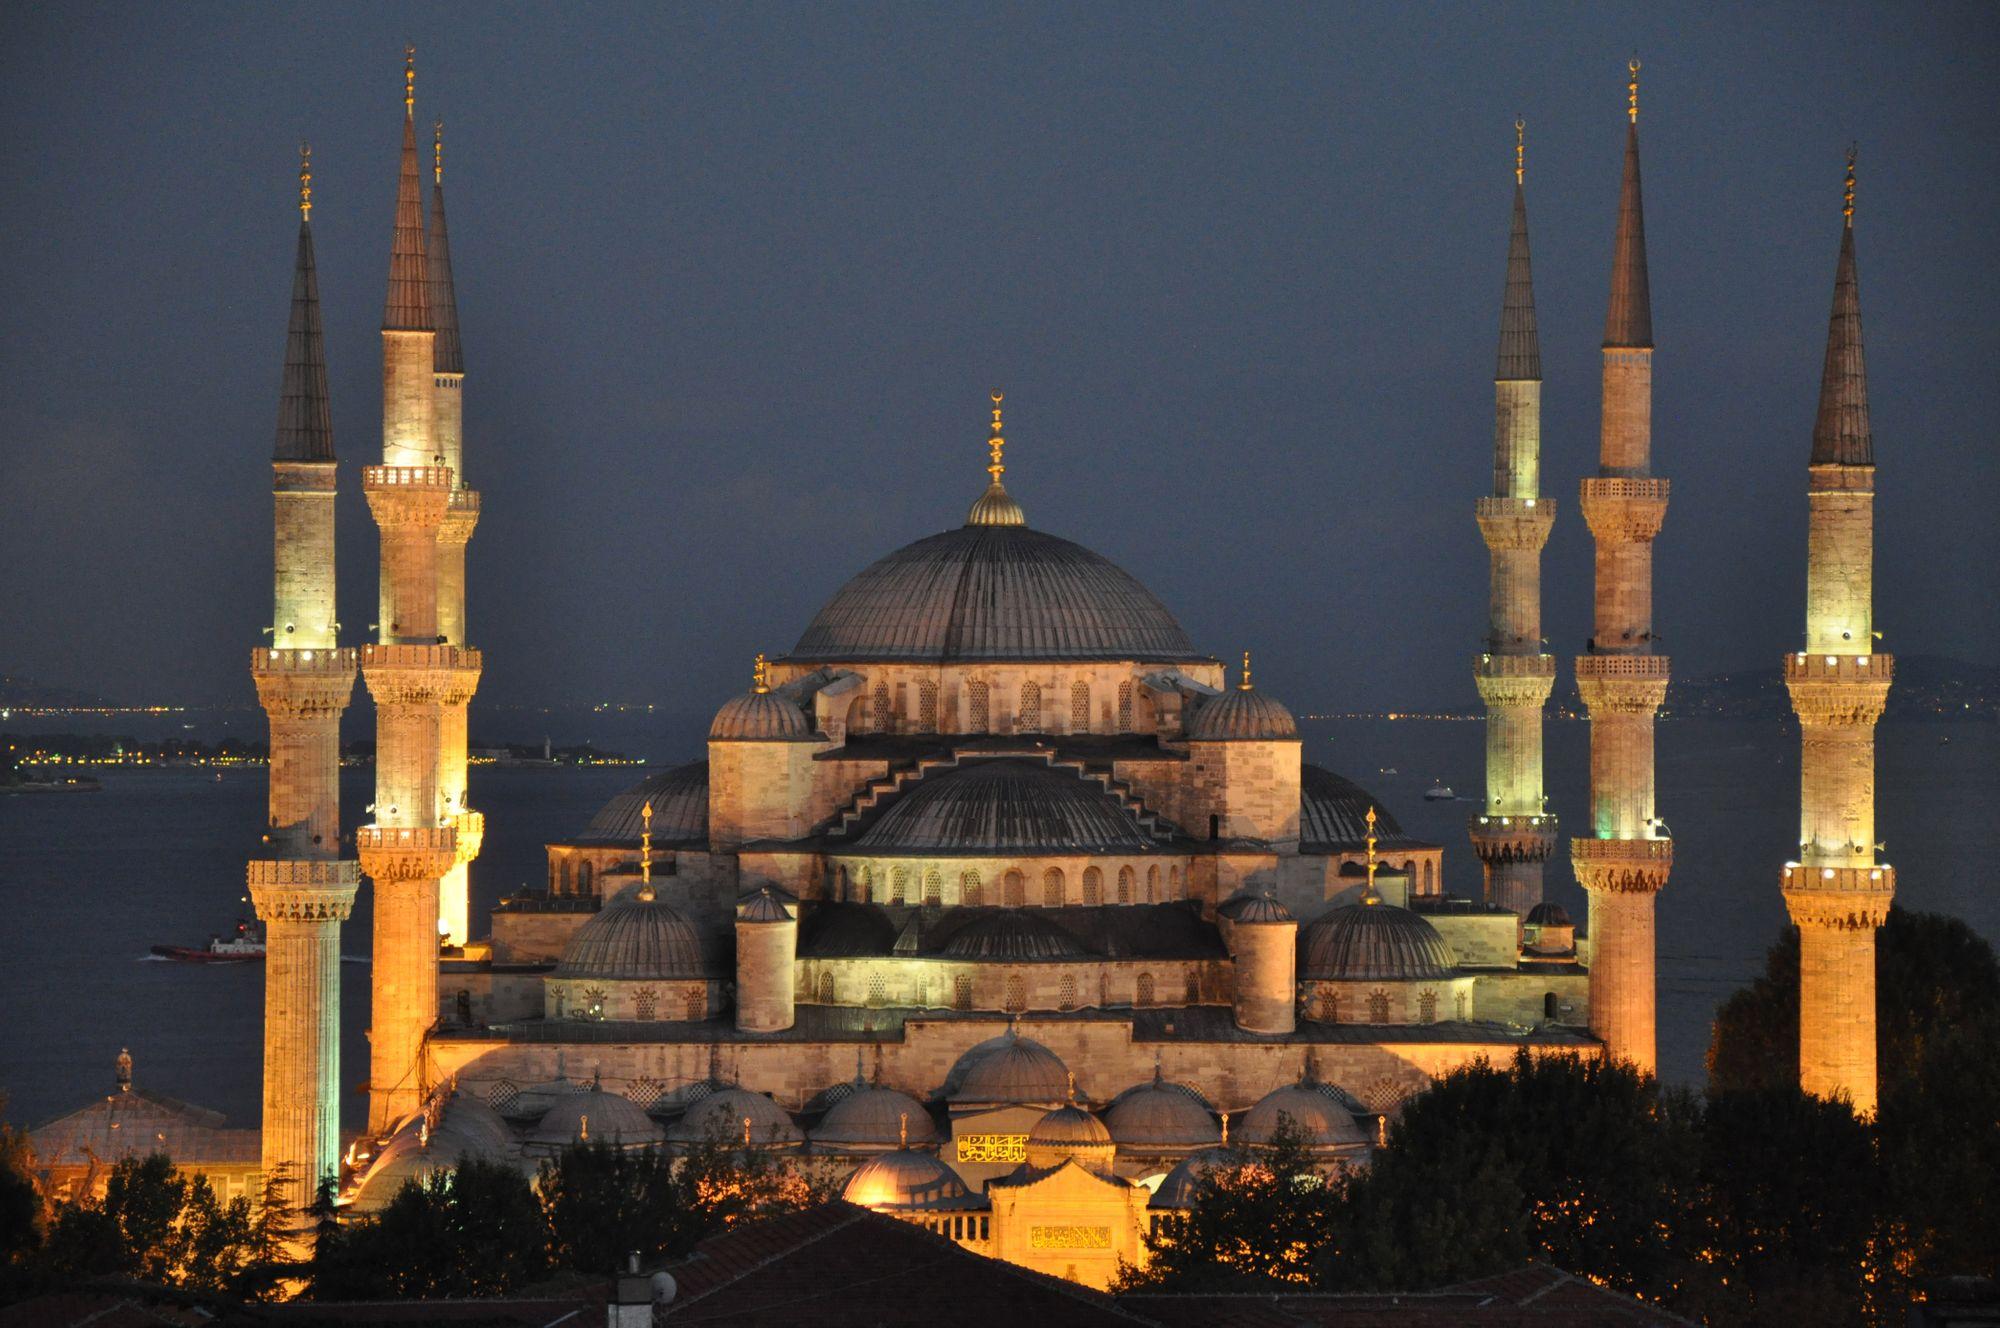 Die Blaue Moschee, Sultanahmet